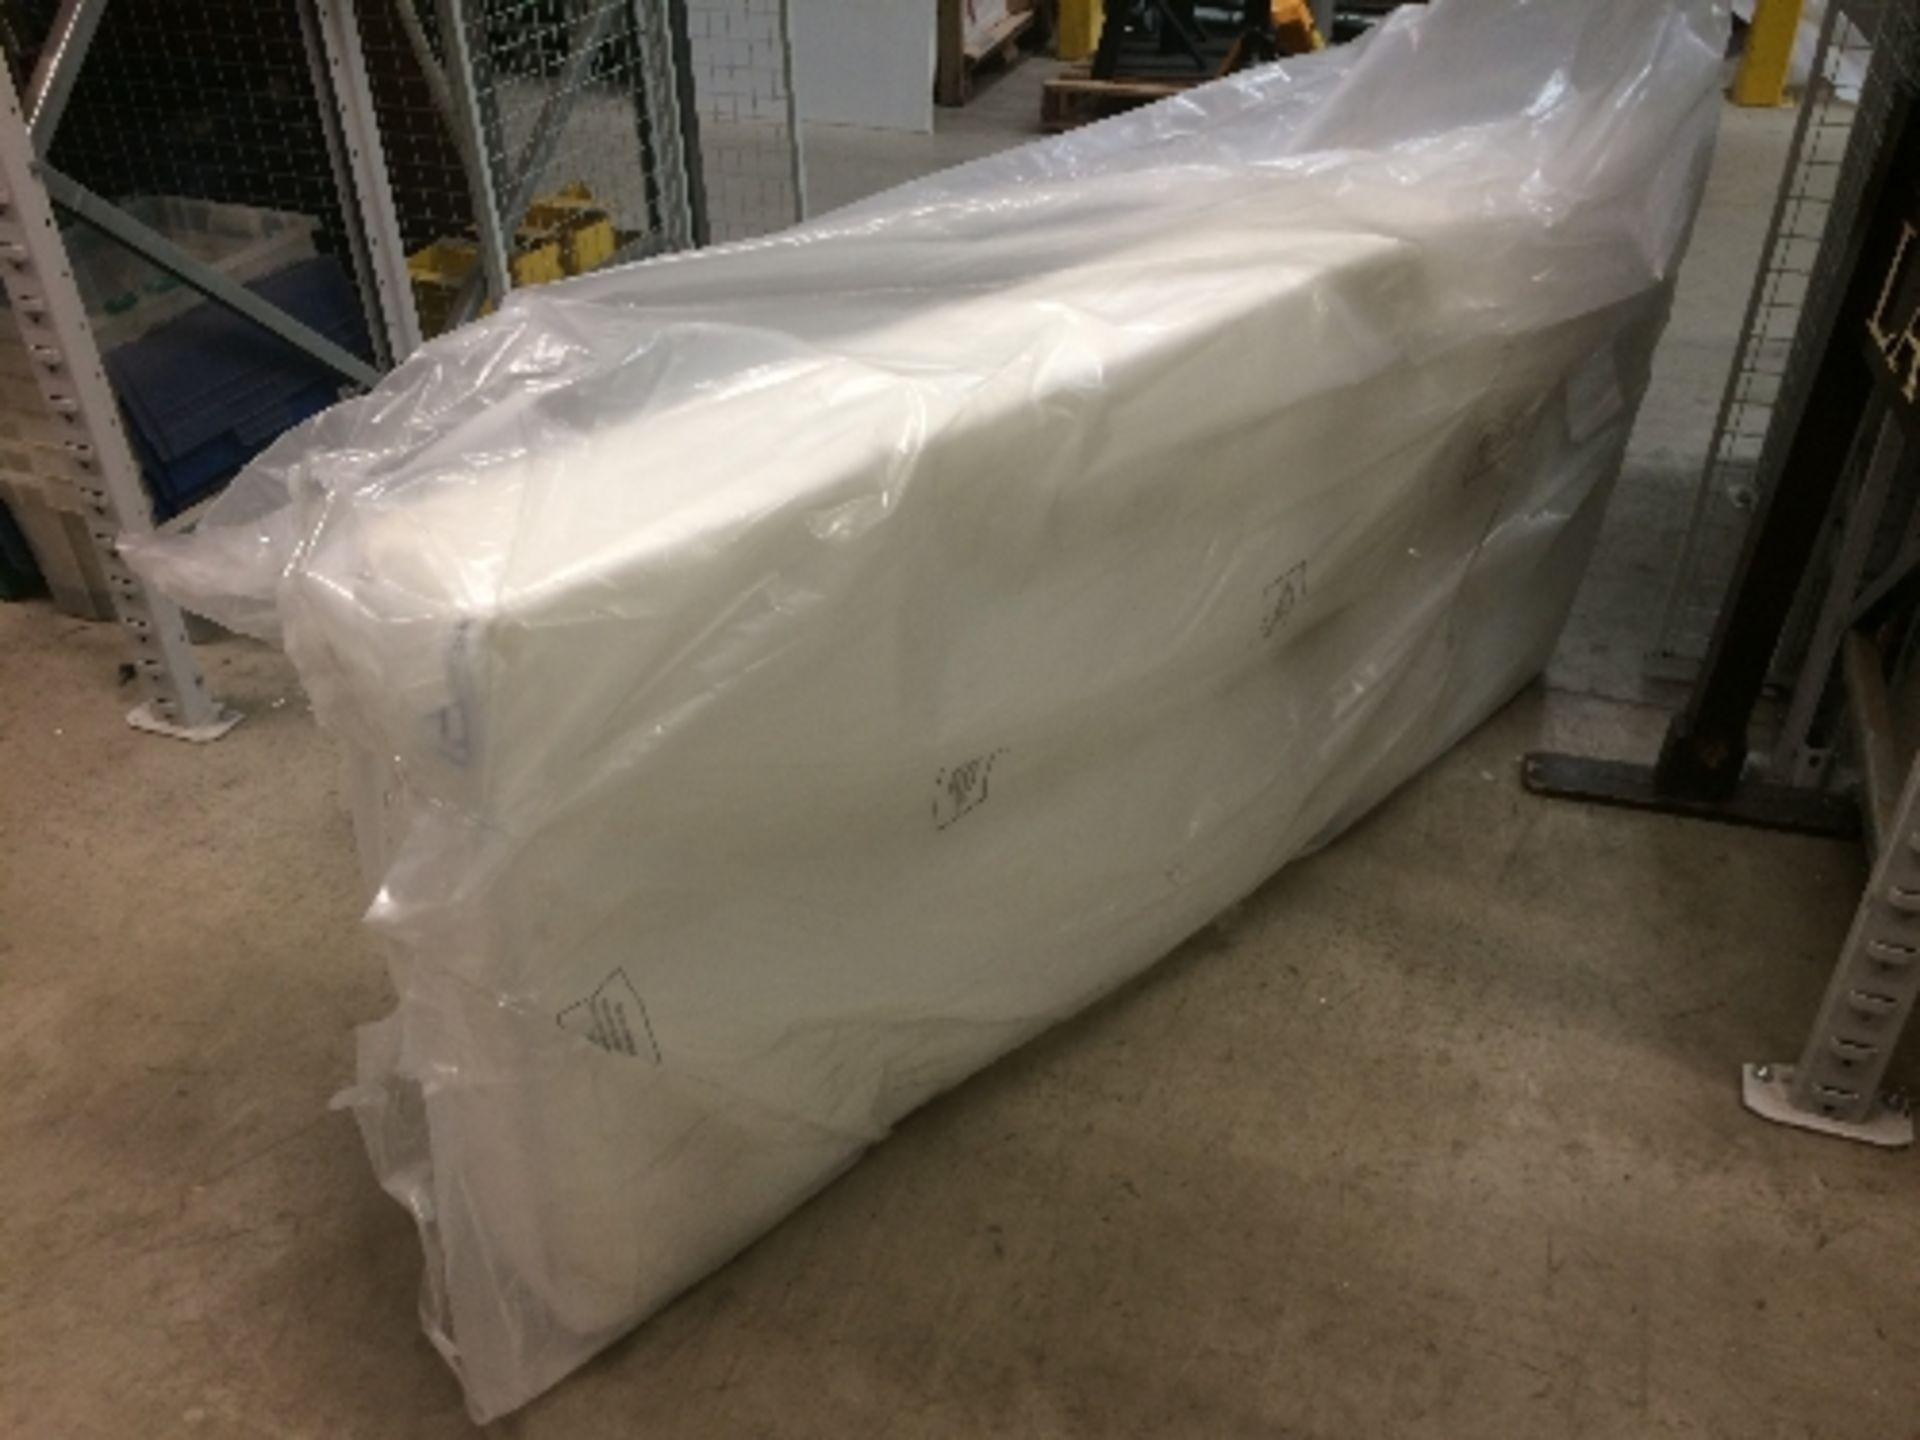 Lot 5 - Mirapocket Ortho 1400 Eco Comfort Mattress 3ft by Silentnight